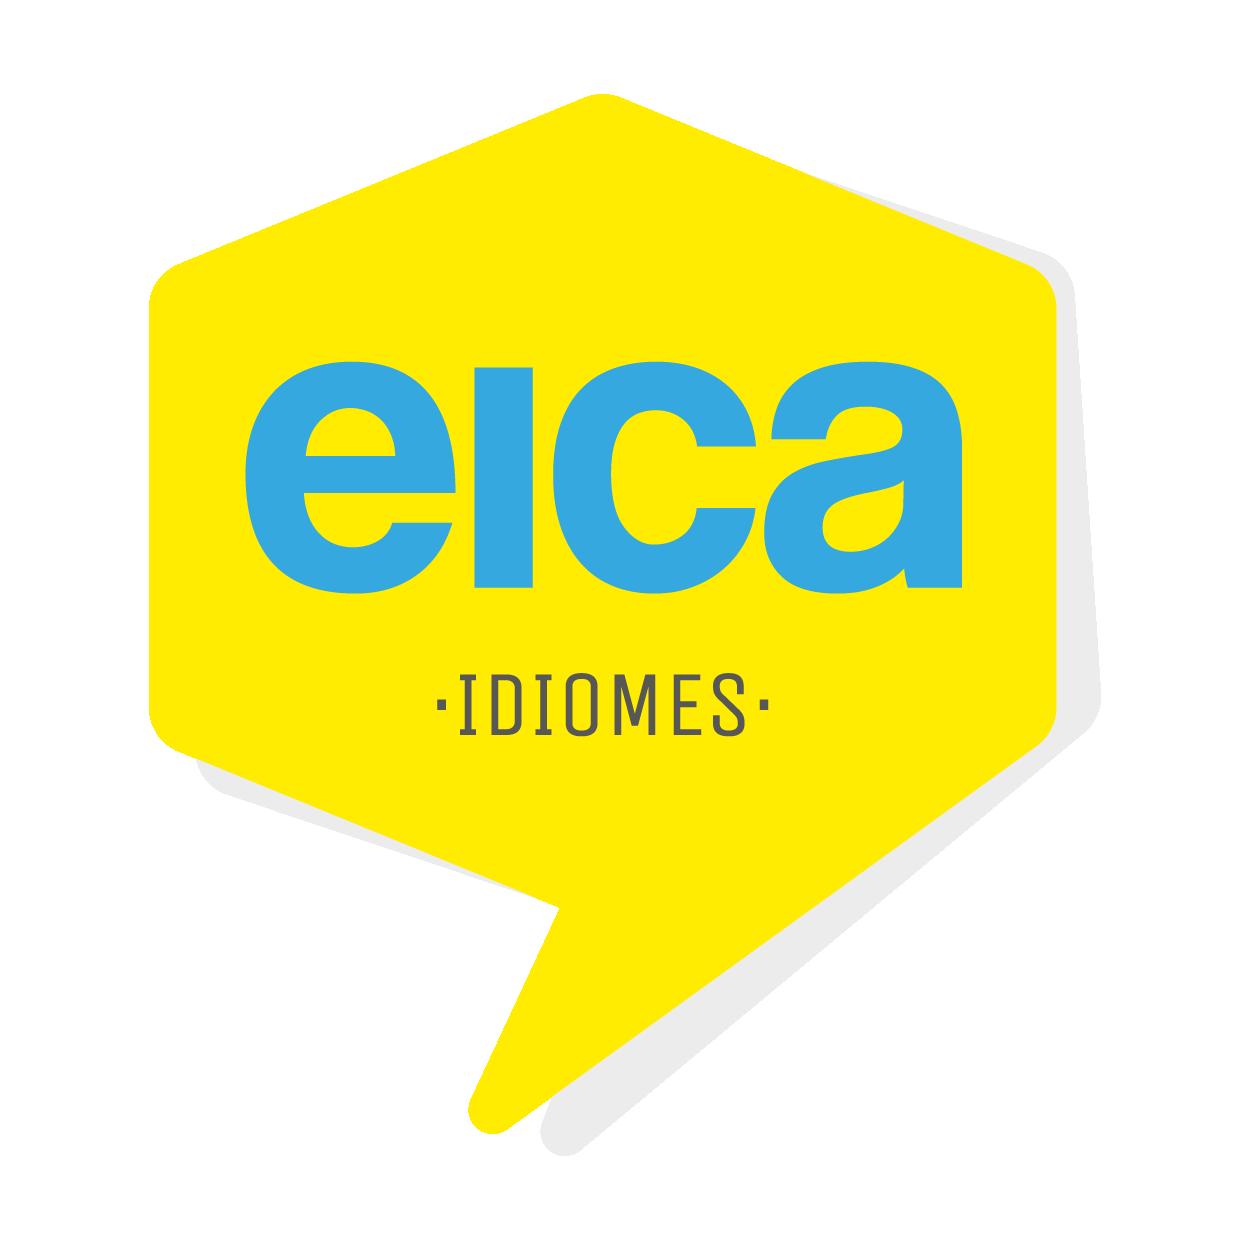 Eica Idiomes